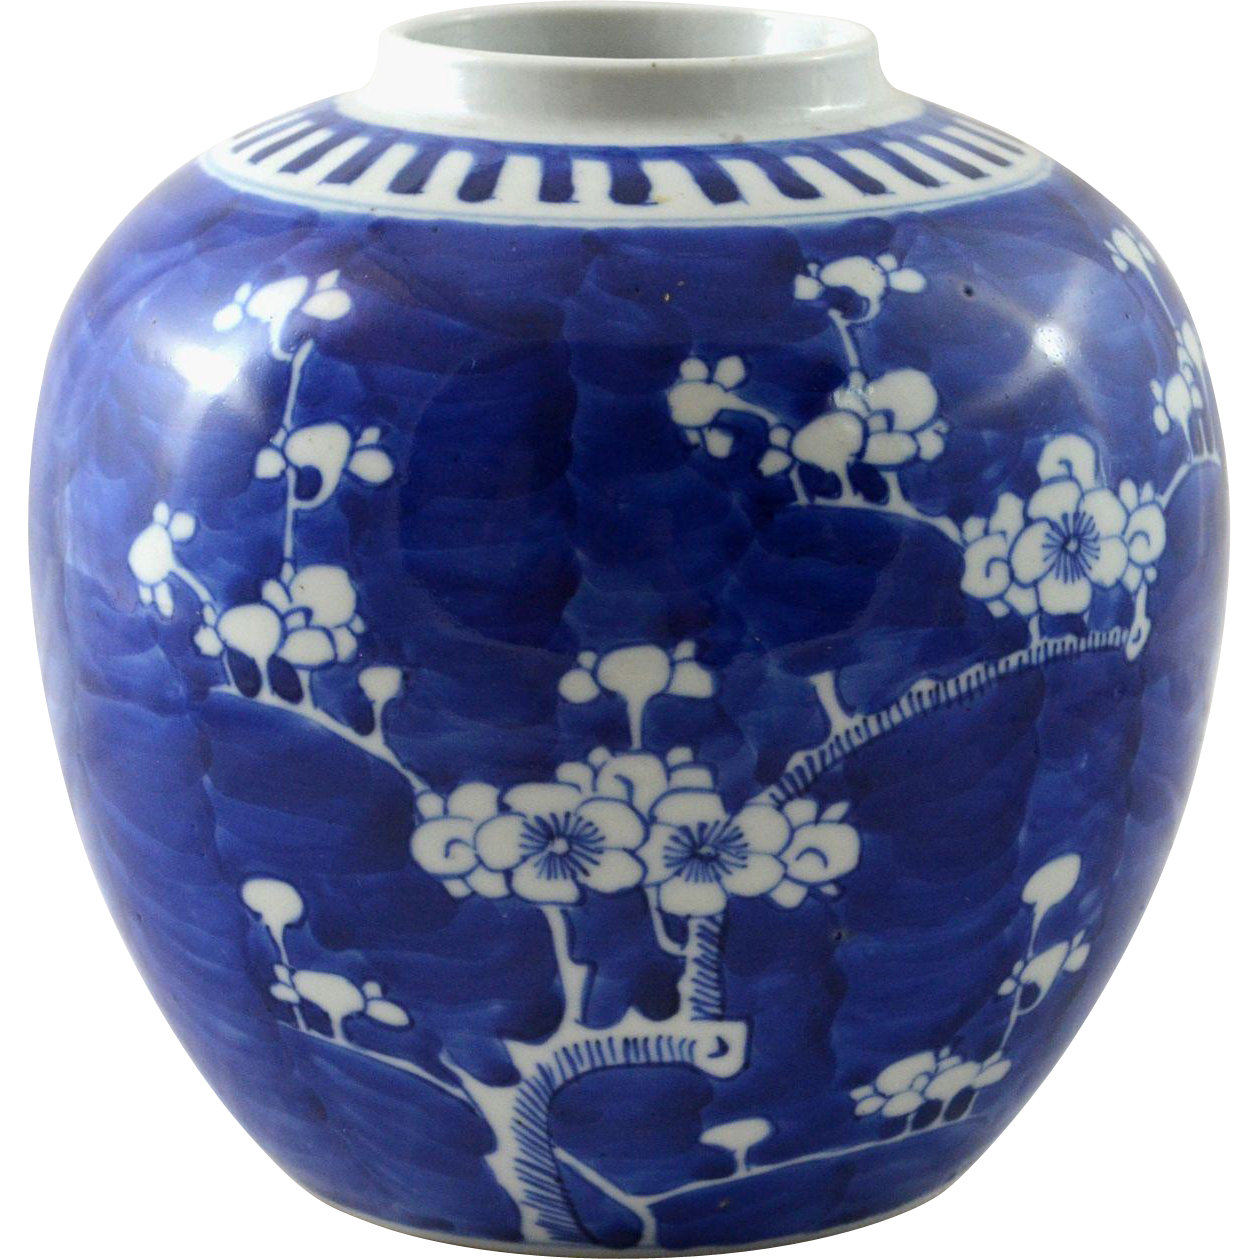 Antique Chinese Cobalt Blue Vase Jar Prunus Or Hawthorn